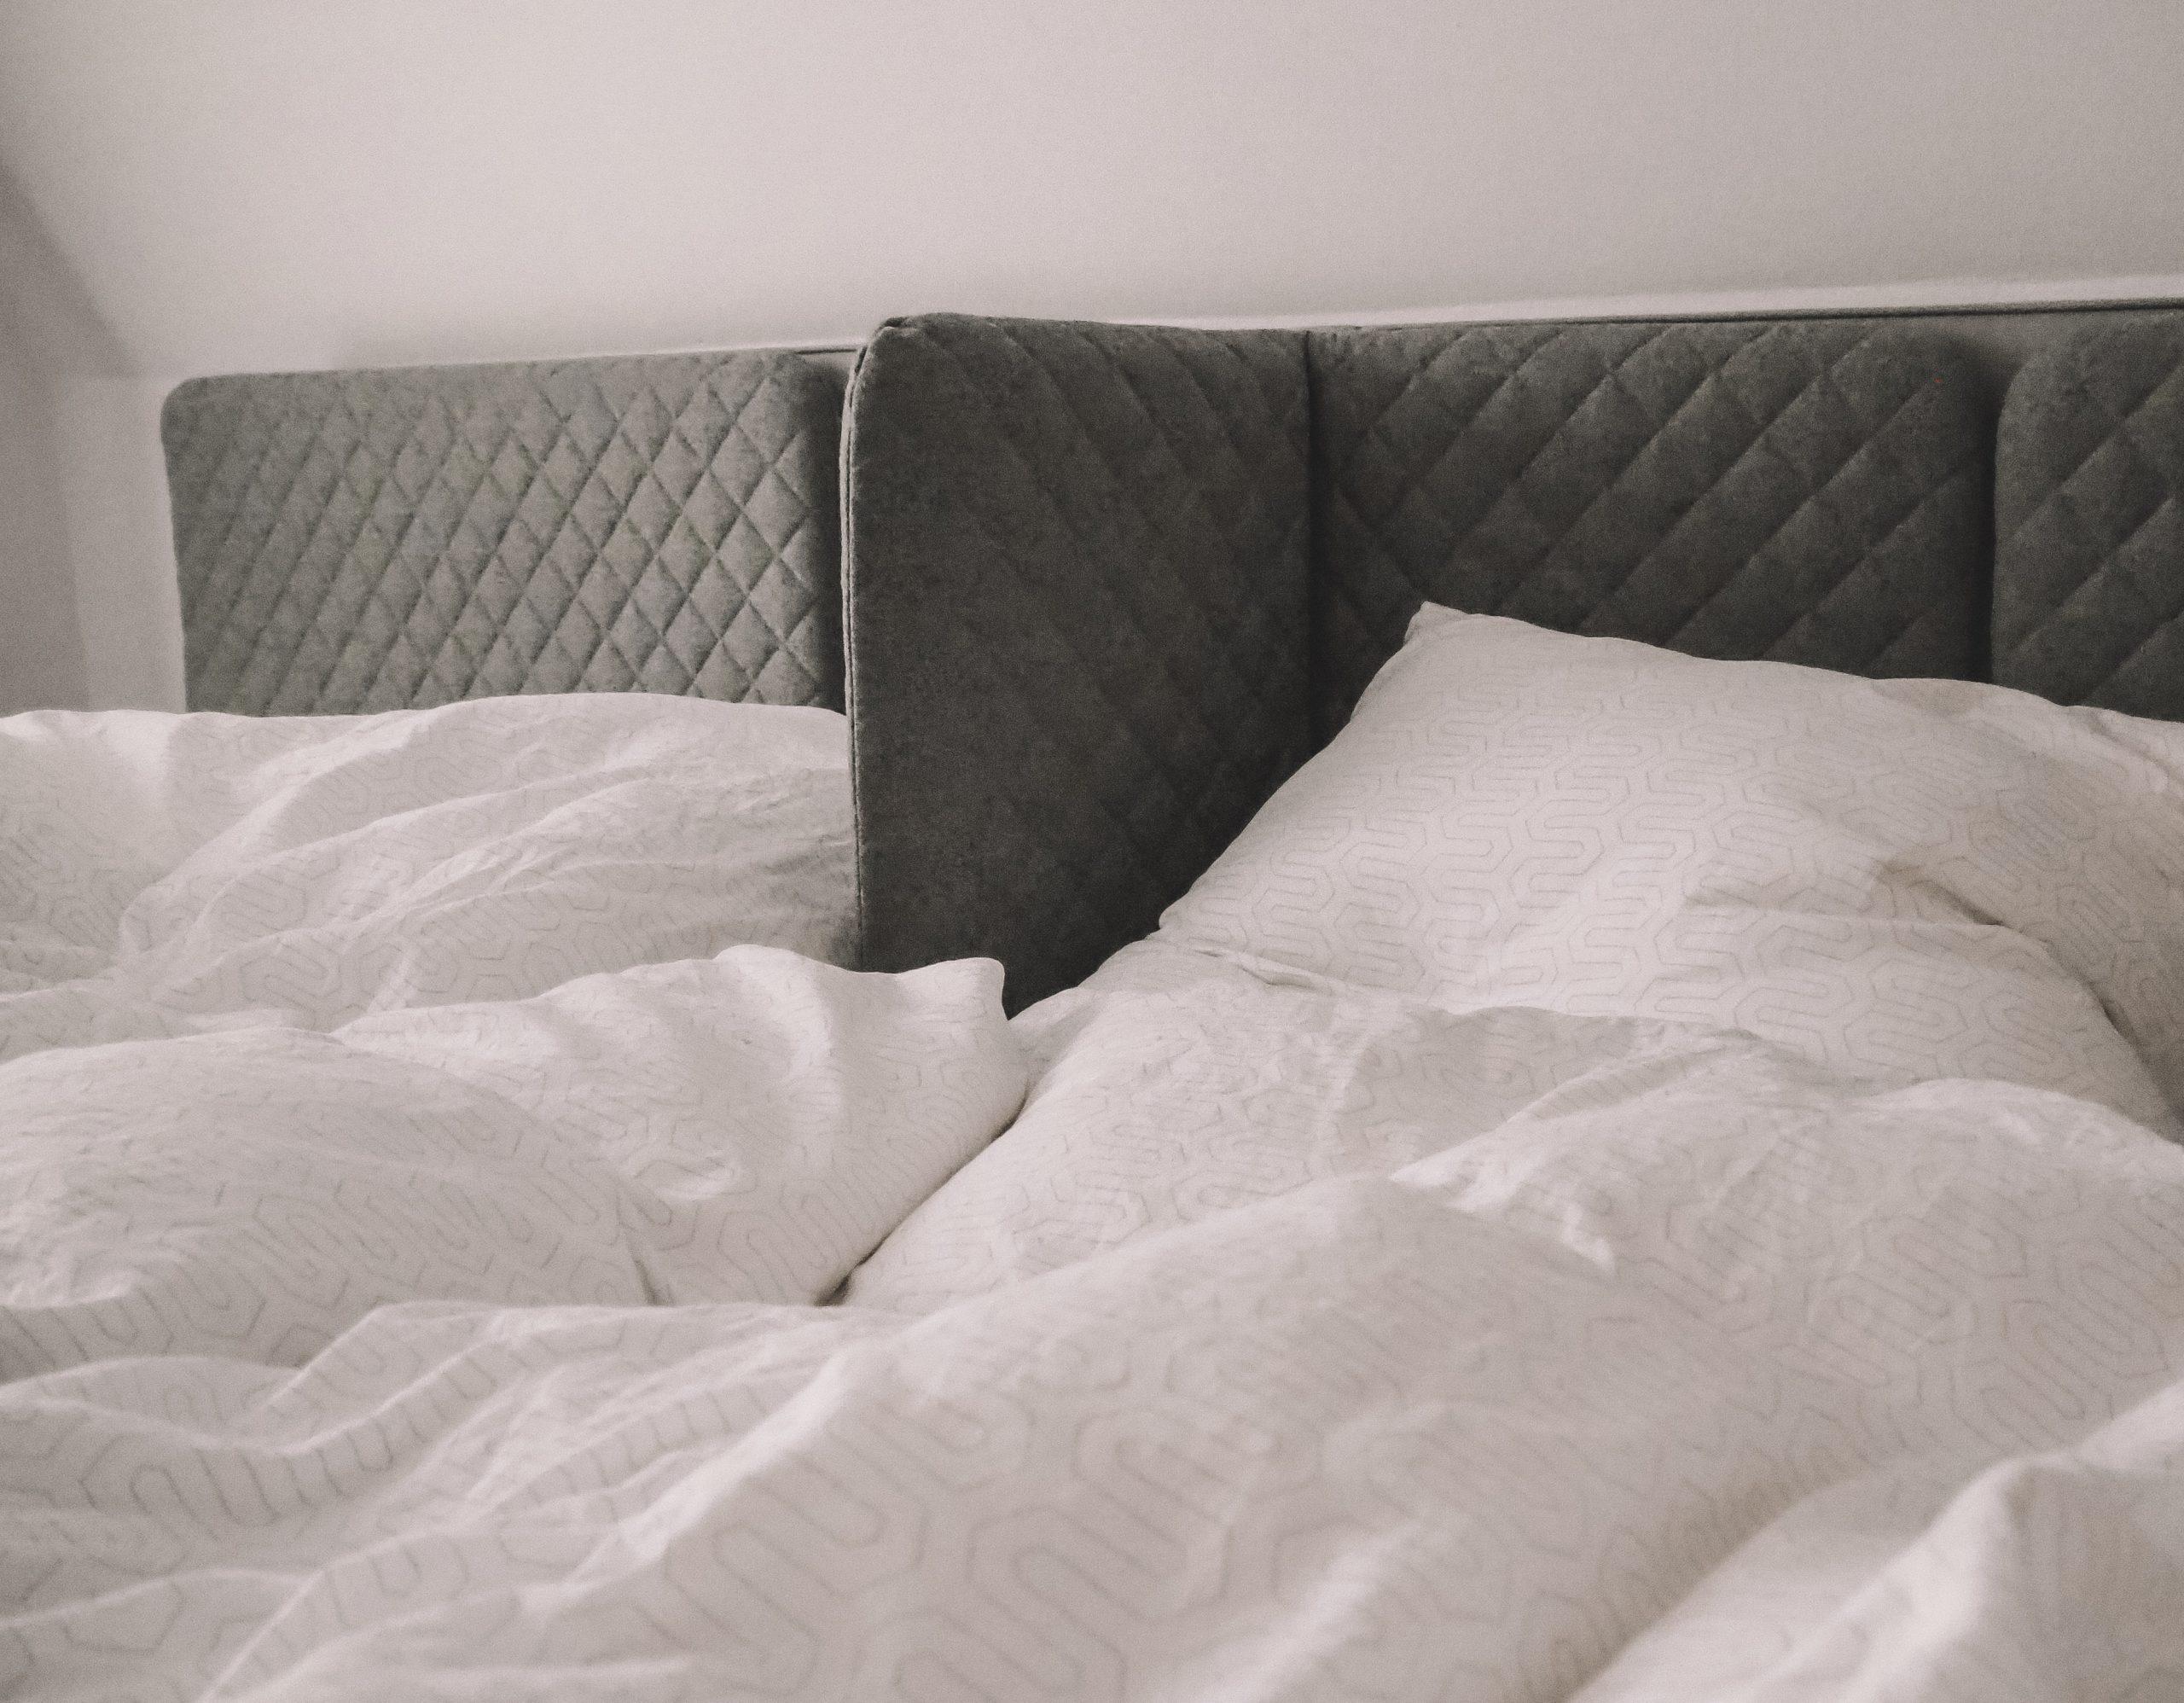 Full Size of Bett Ausklappbar Ausklappbares Selber Bauen Mit Stauraum 180x200 Klappbar Englisch Zum Ausklappen Wand Doppelbett Ikea Schrank Wandbefestigung Sofa Schlaf Gut Bett Bett Ausklappbar